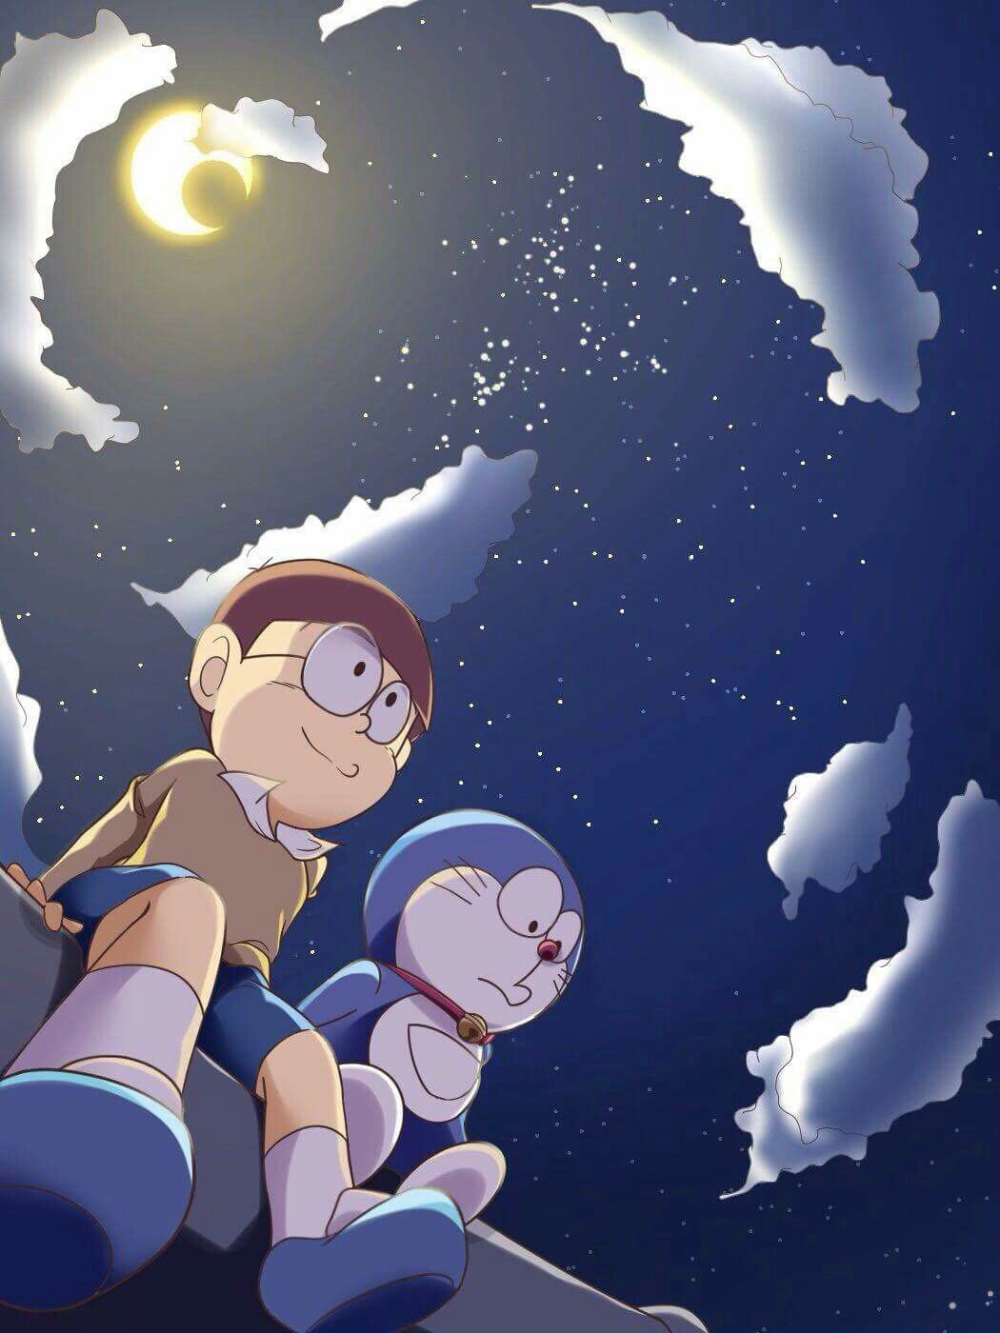 Aesthetic Cute Doraemon And Nobita Wallpaper Hd - doraemon in 2020 | Doraemon  wallpapers, Doraemon cartoon, Cartoon wallpaper